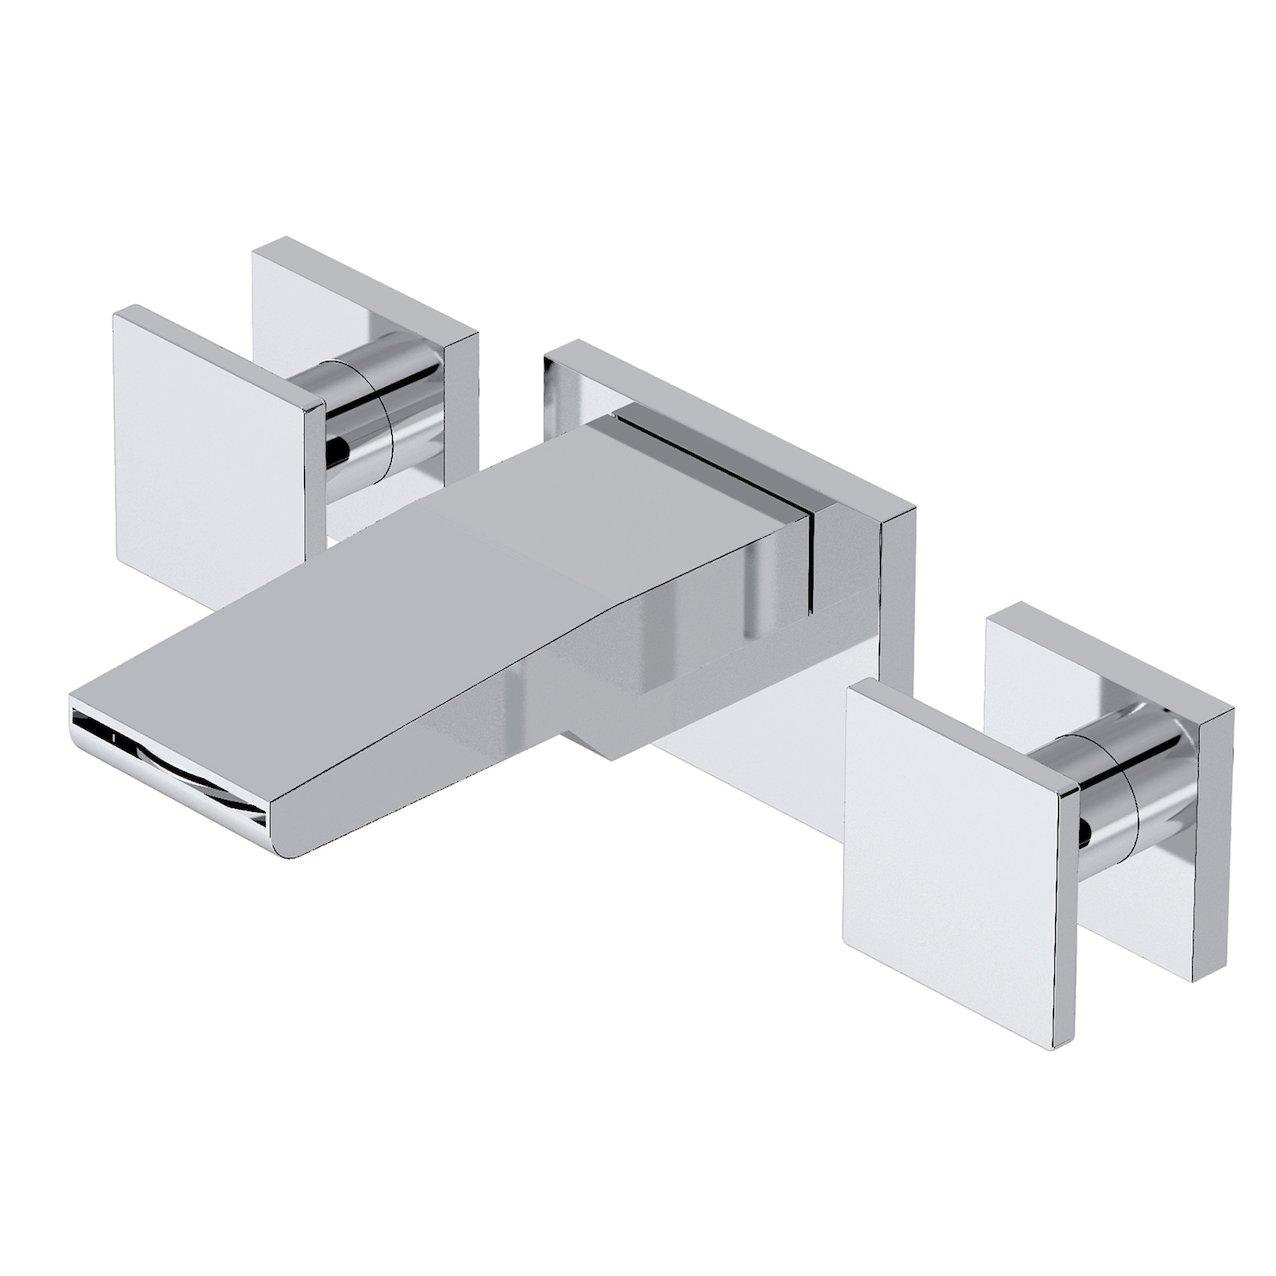 Miscelatore lavabo a parete Aquadra